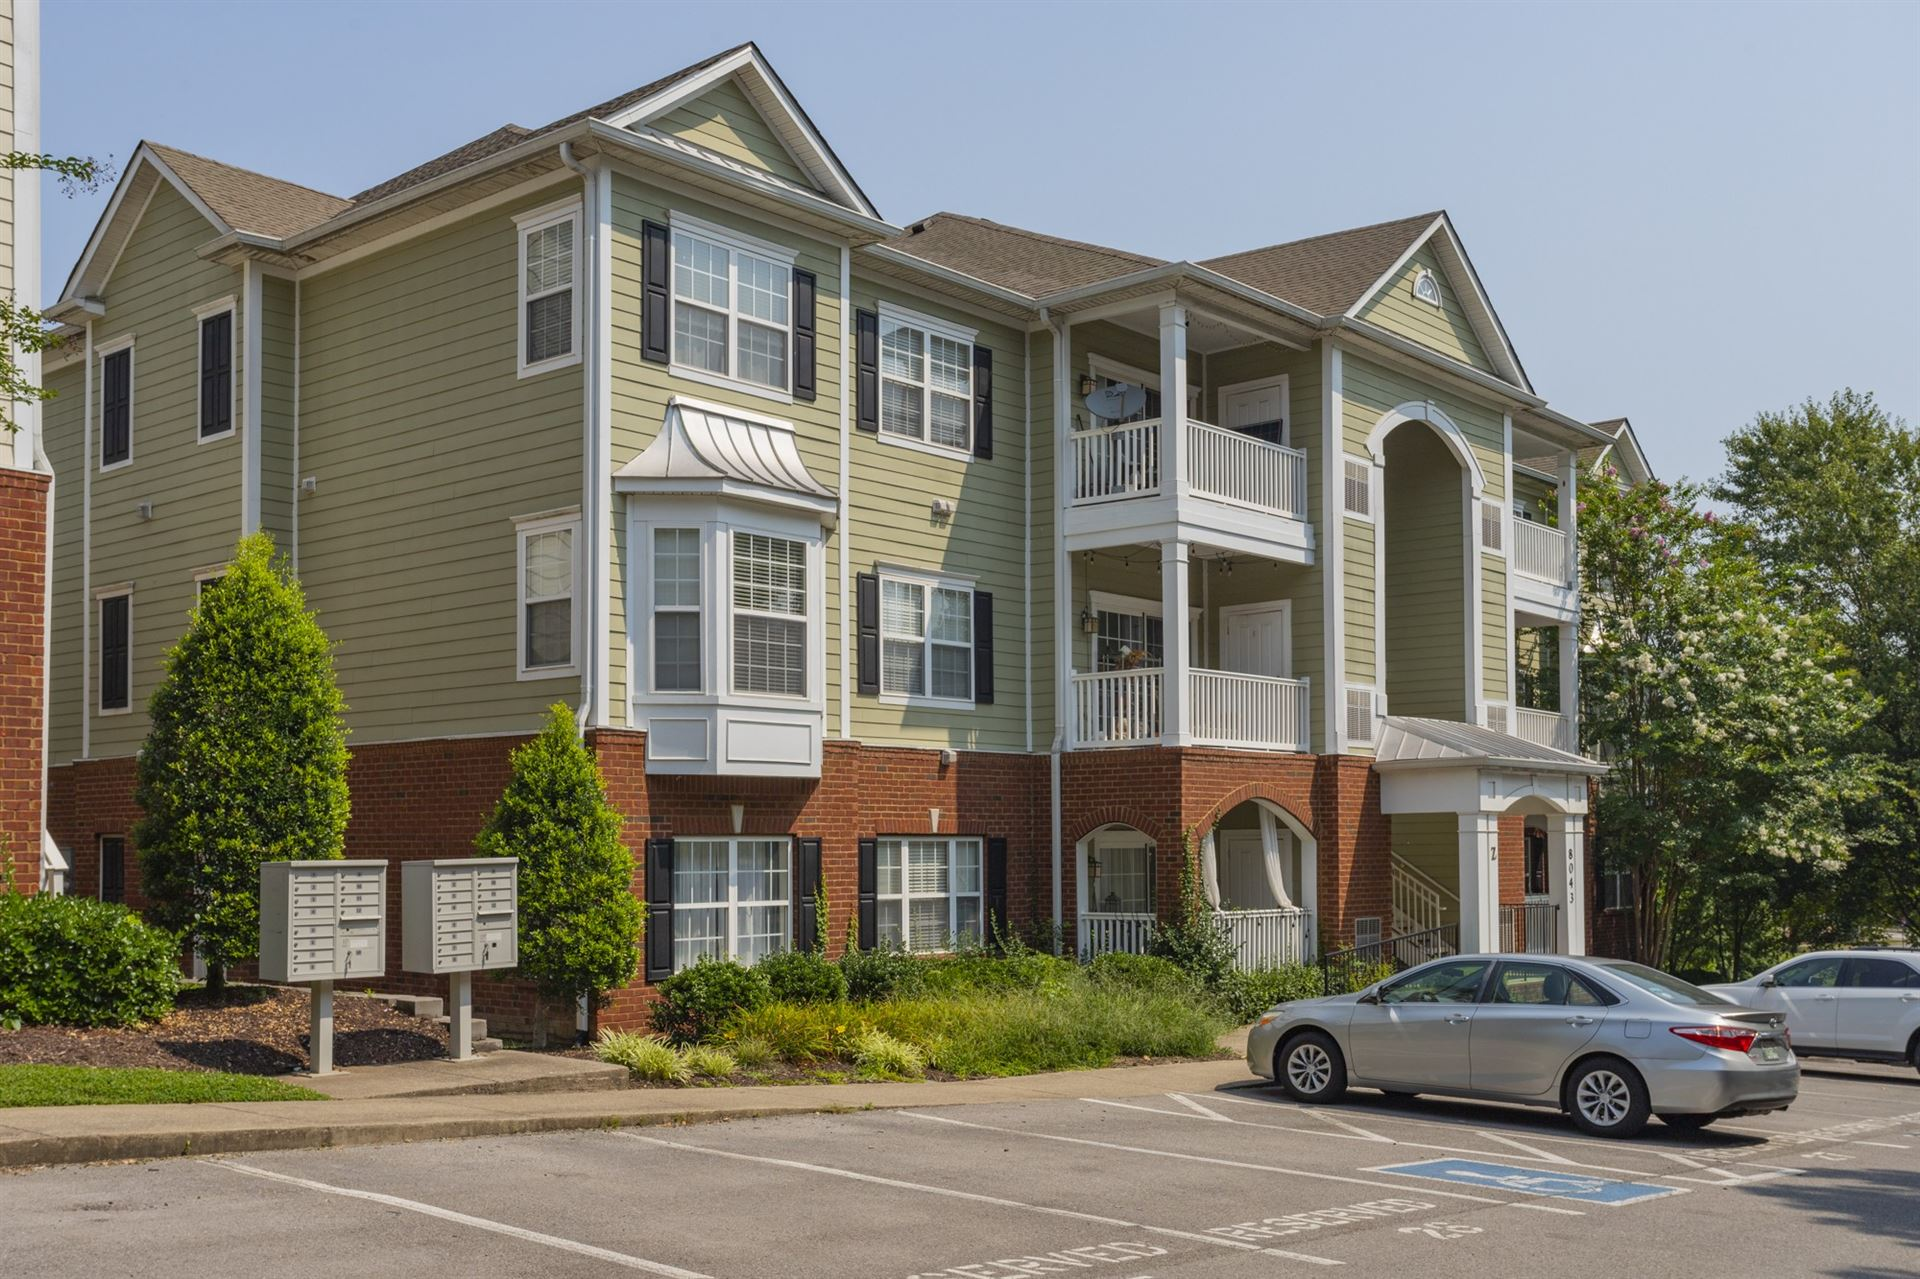 Photo of 8043 Bienville Dr #Z11, Nashville, TN 37211 (MLS # 2275692)